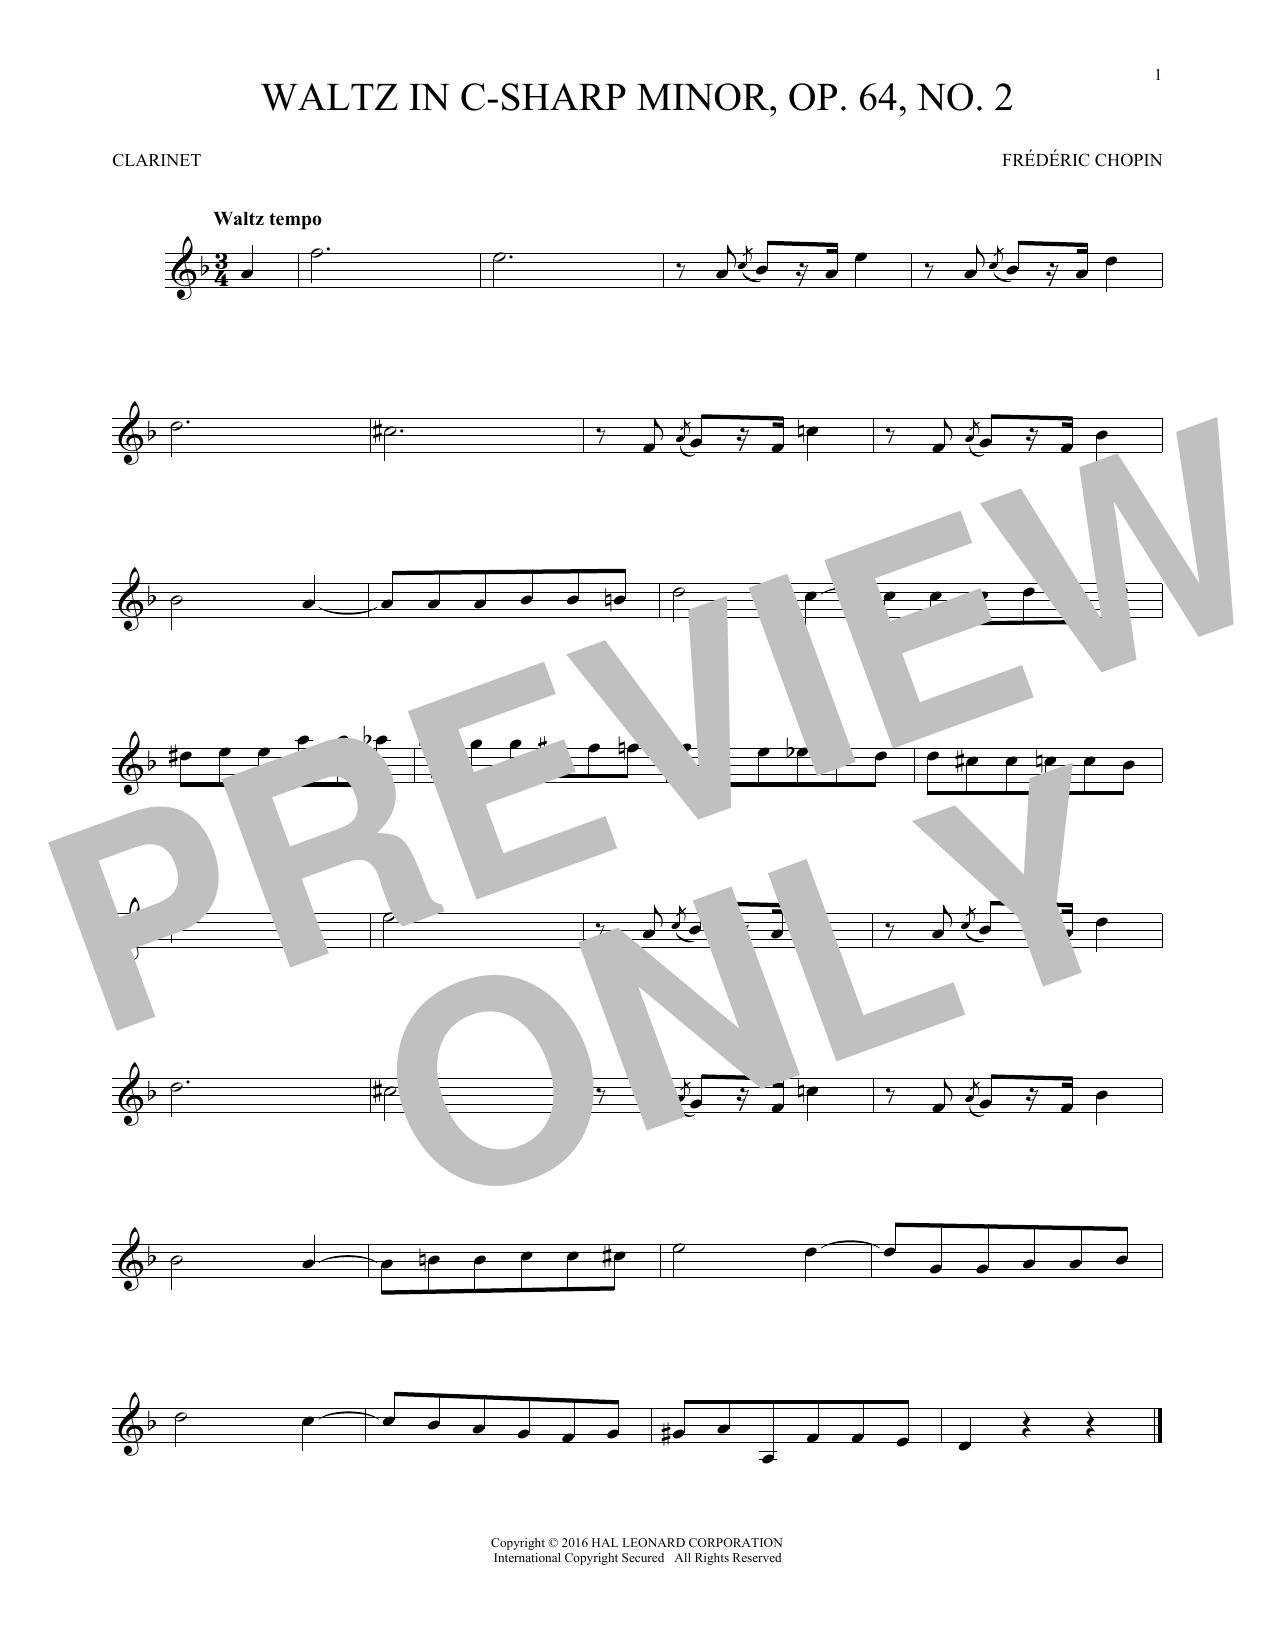 Waltz In C-Sharp Minor, Op. 64, No. 2 (Clarinet Solo)